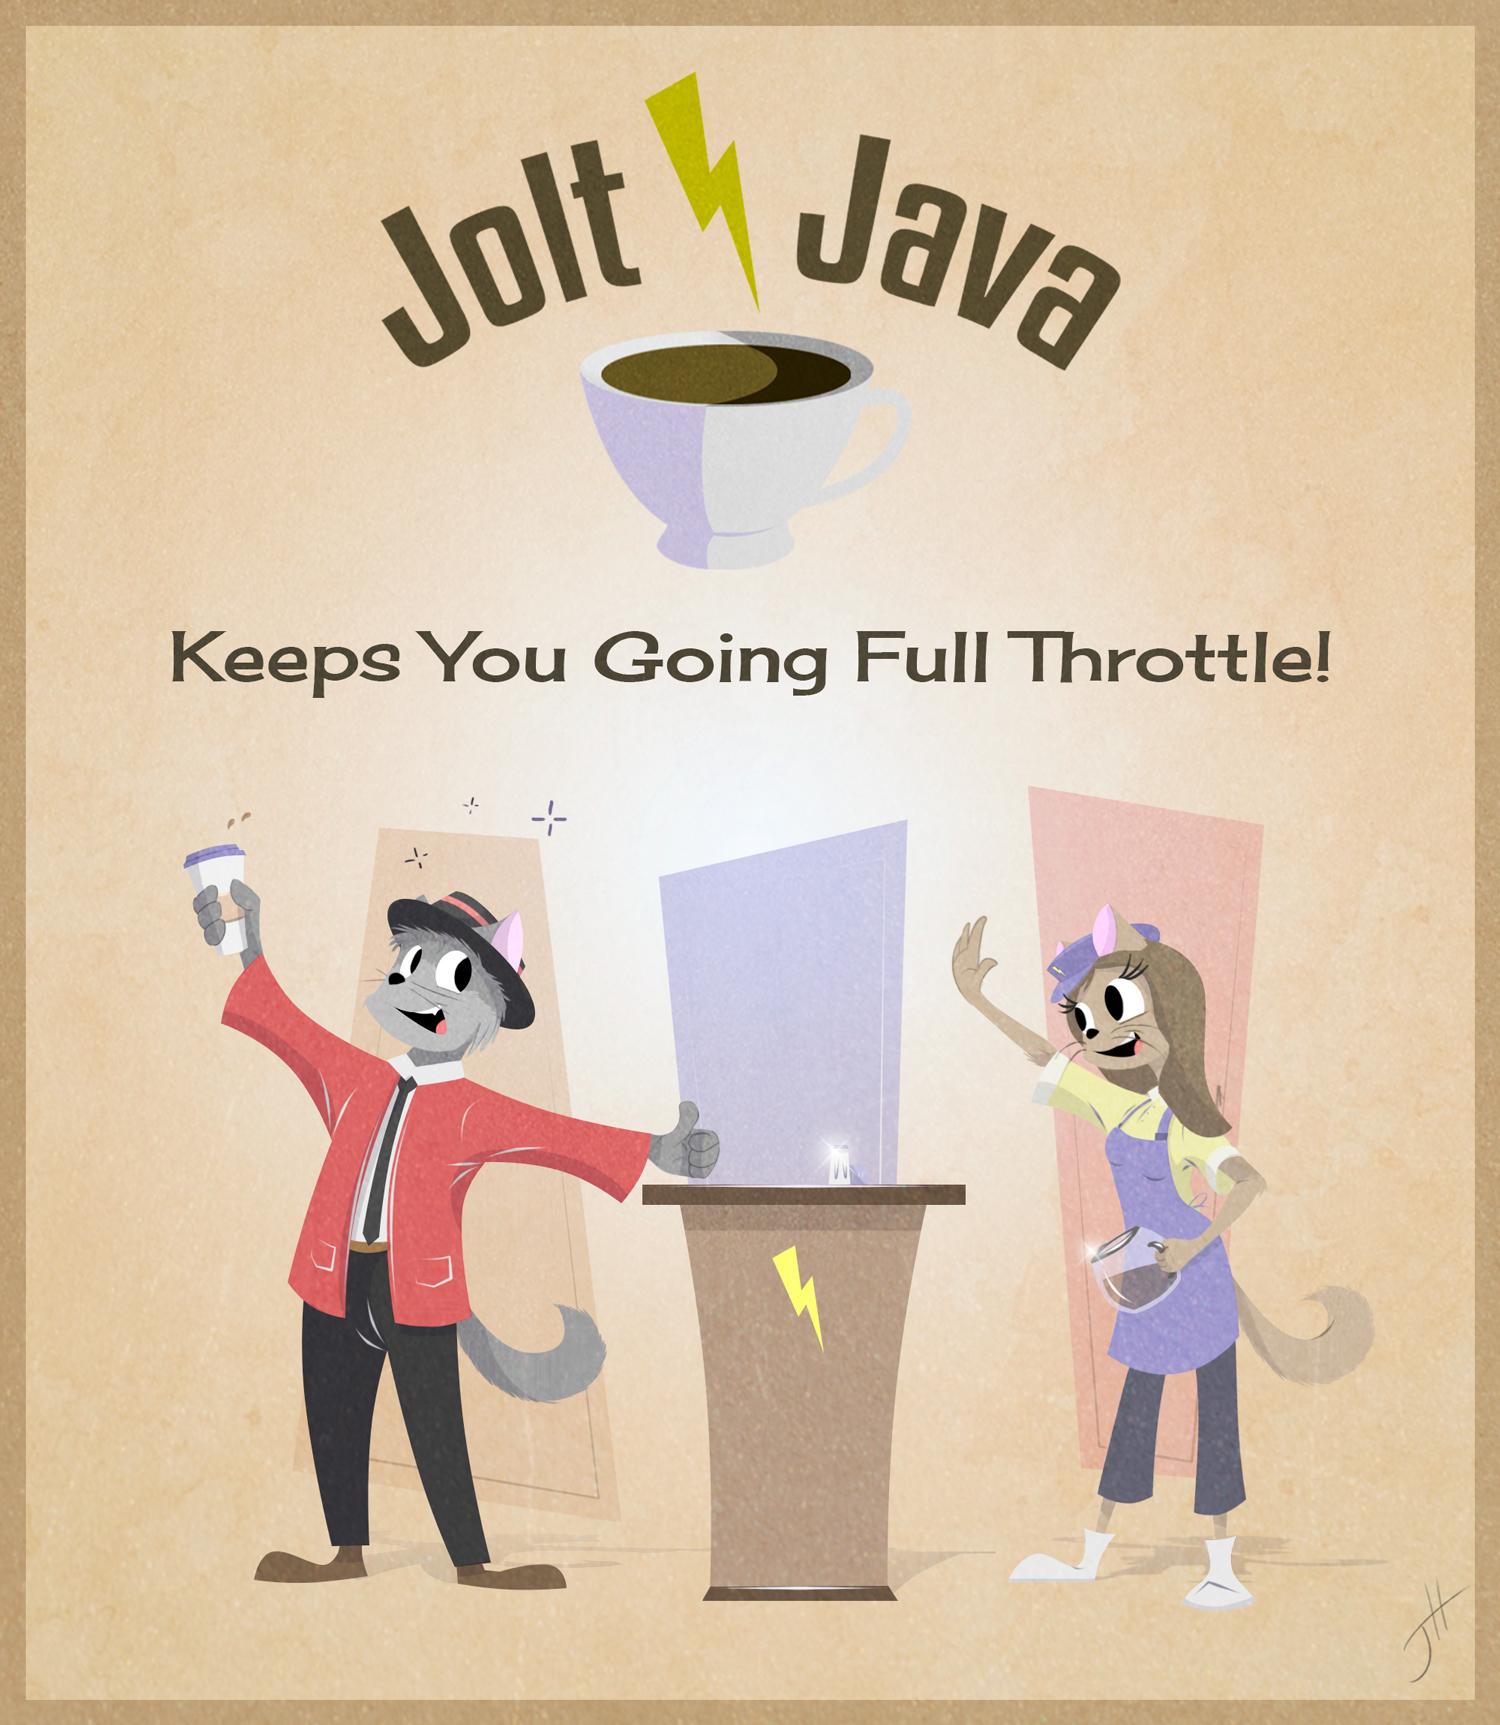 Jolt Java Poster Ad